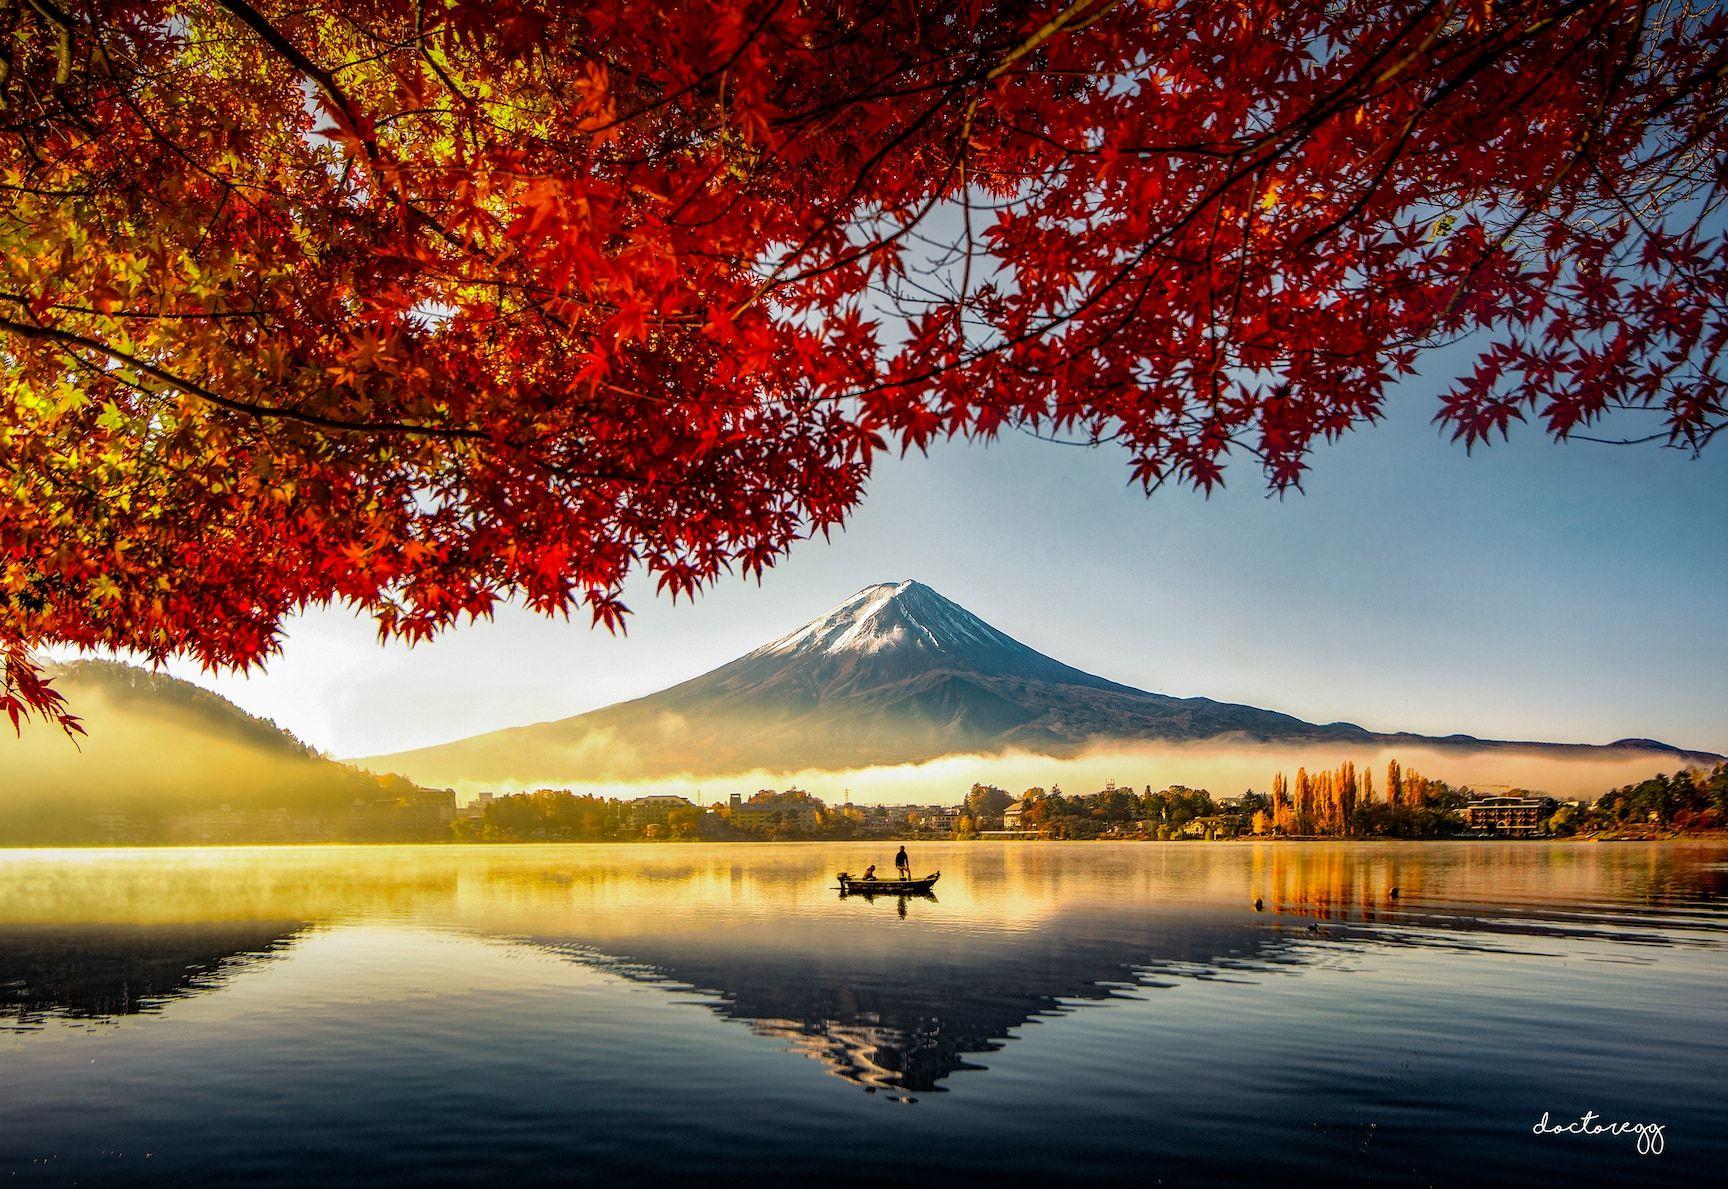 Photo by : DoctorEgg . Follow us for amazing posts! #PASHADELIC #FUJIdelic . . #light_nikon #nikond610 #mtfuji #fujiyama #fujisan #photography #photooftheday #nature #naturephotography #landscape #landscapephotography #japan #japan_of_insta #japanphoto #igers #ig_japan #mountain #mountains #mountainphotography #富士山 #富士 #山